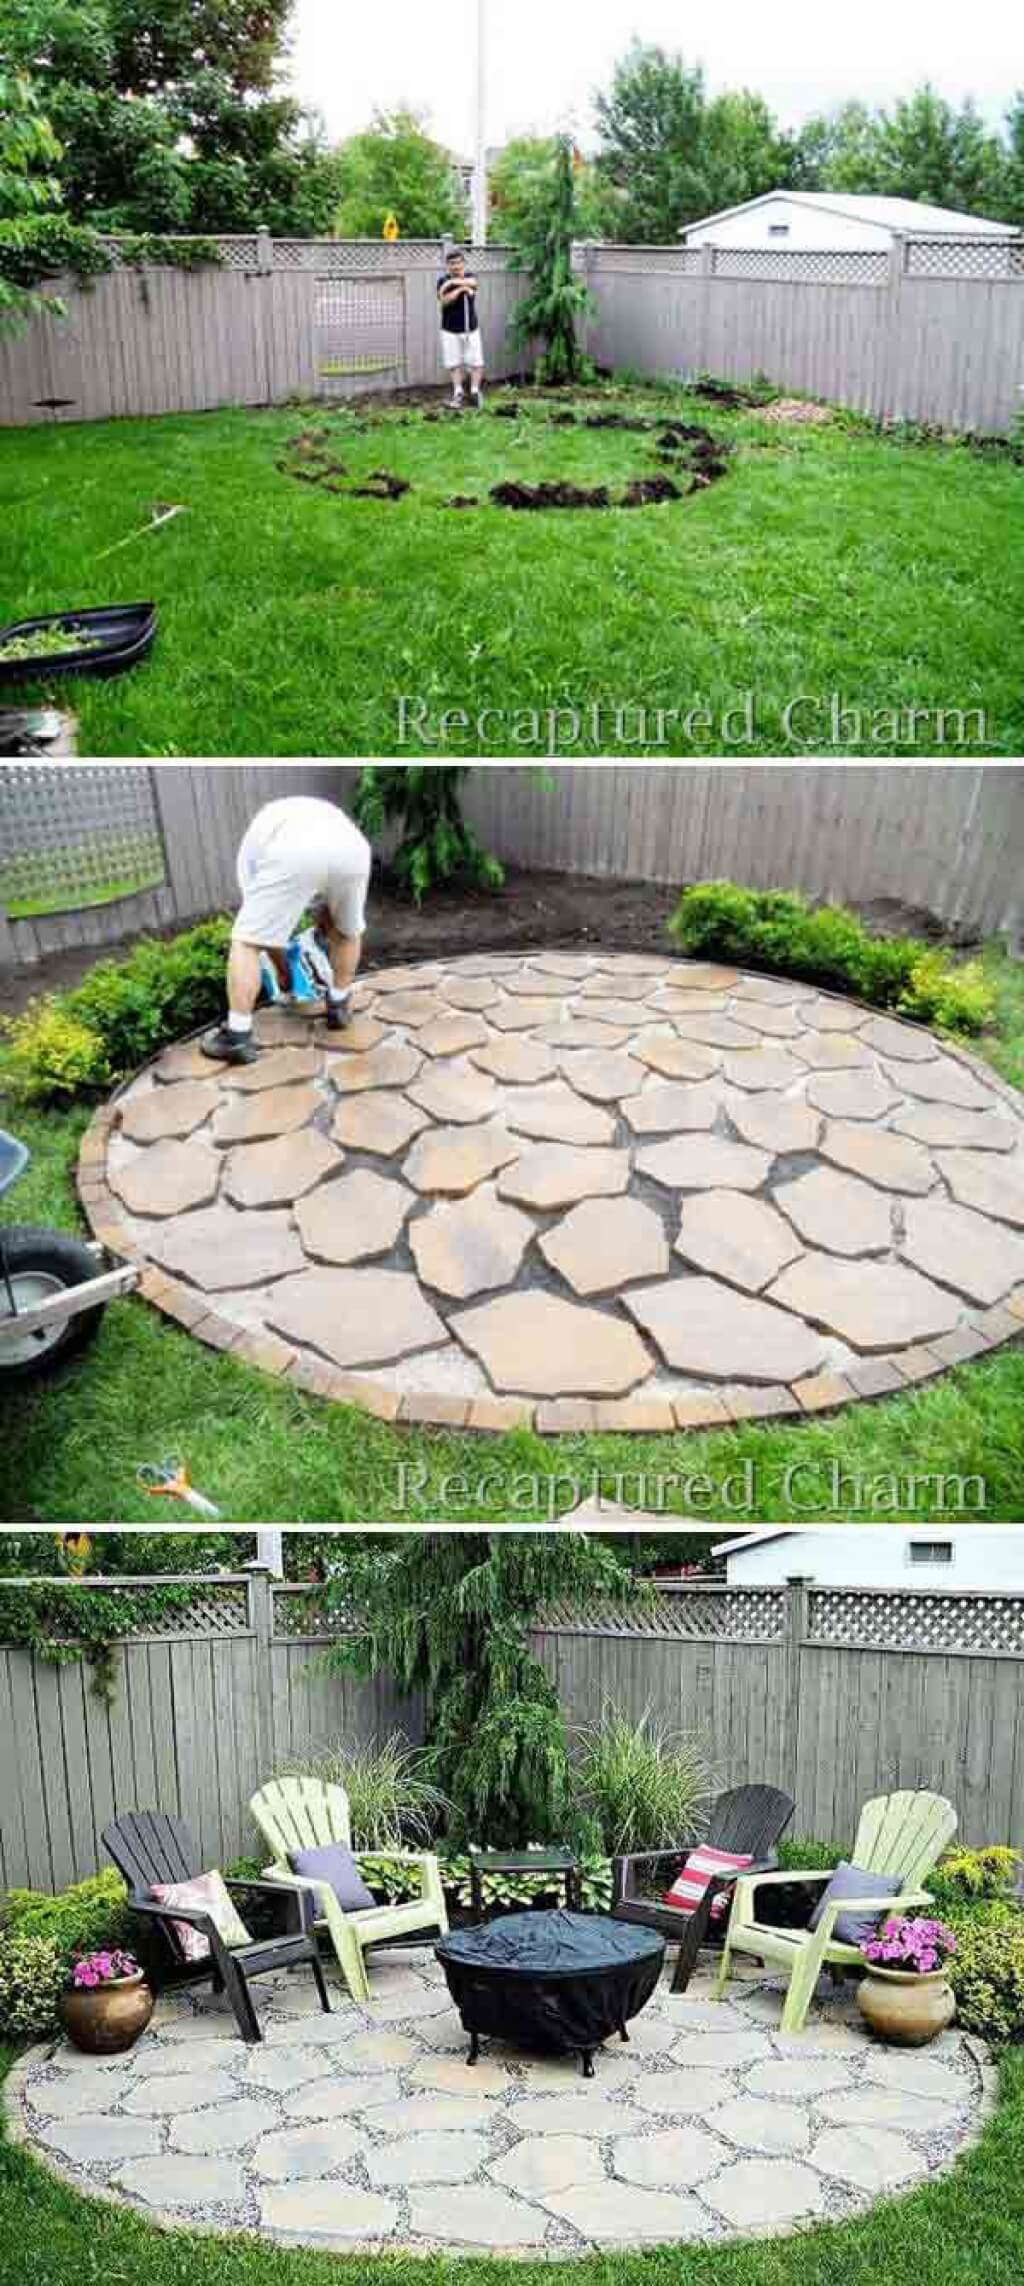 A Stone Patio for Backyard Entertainment